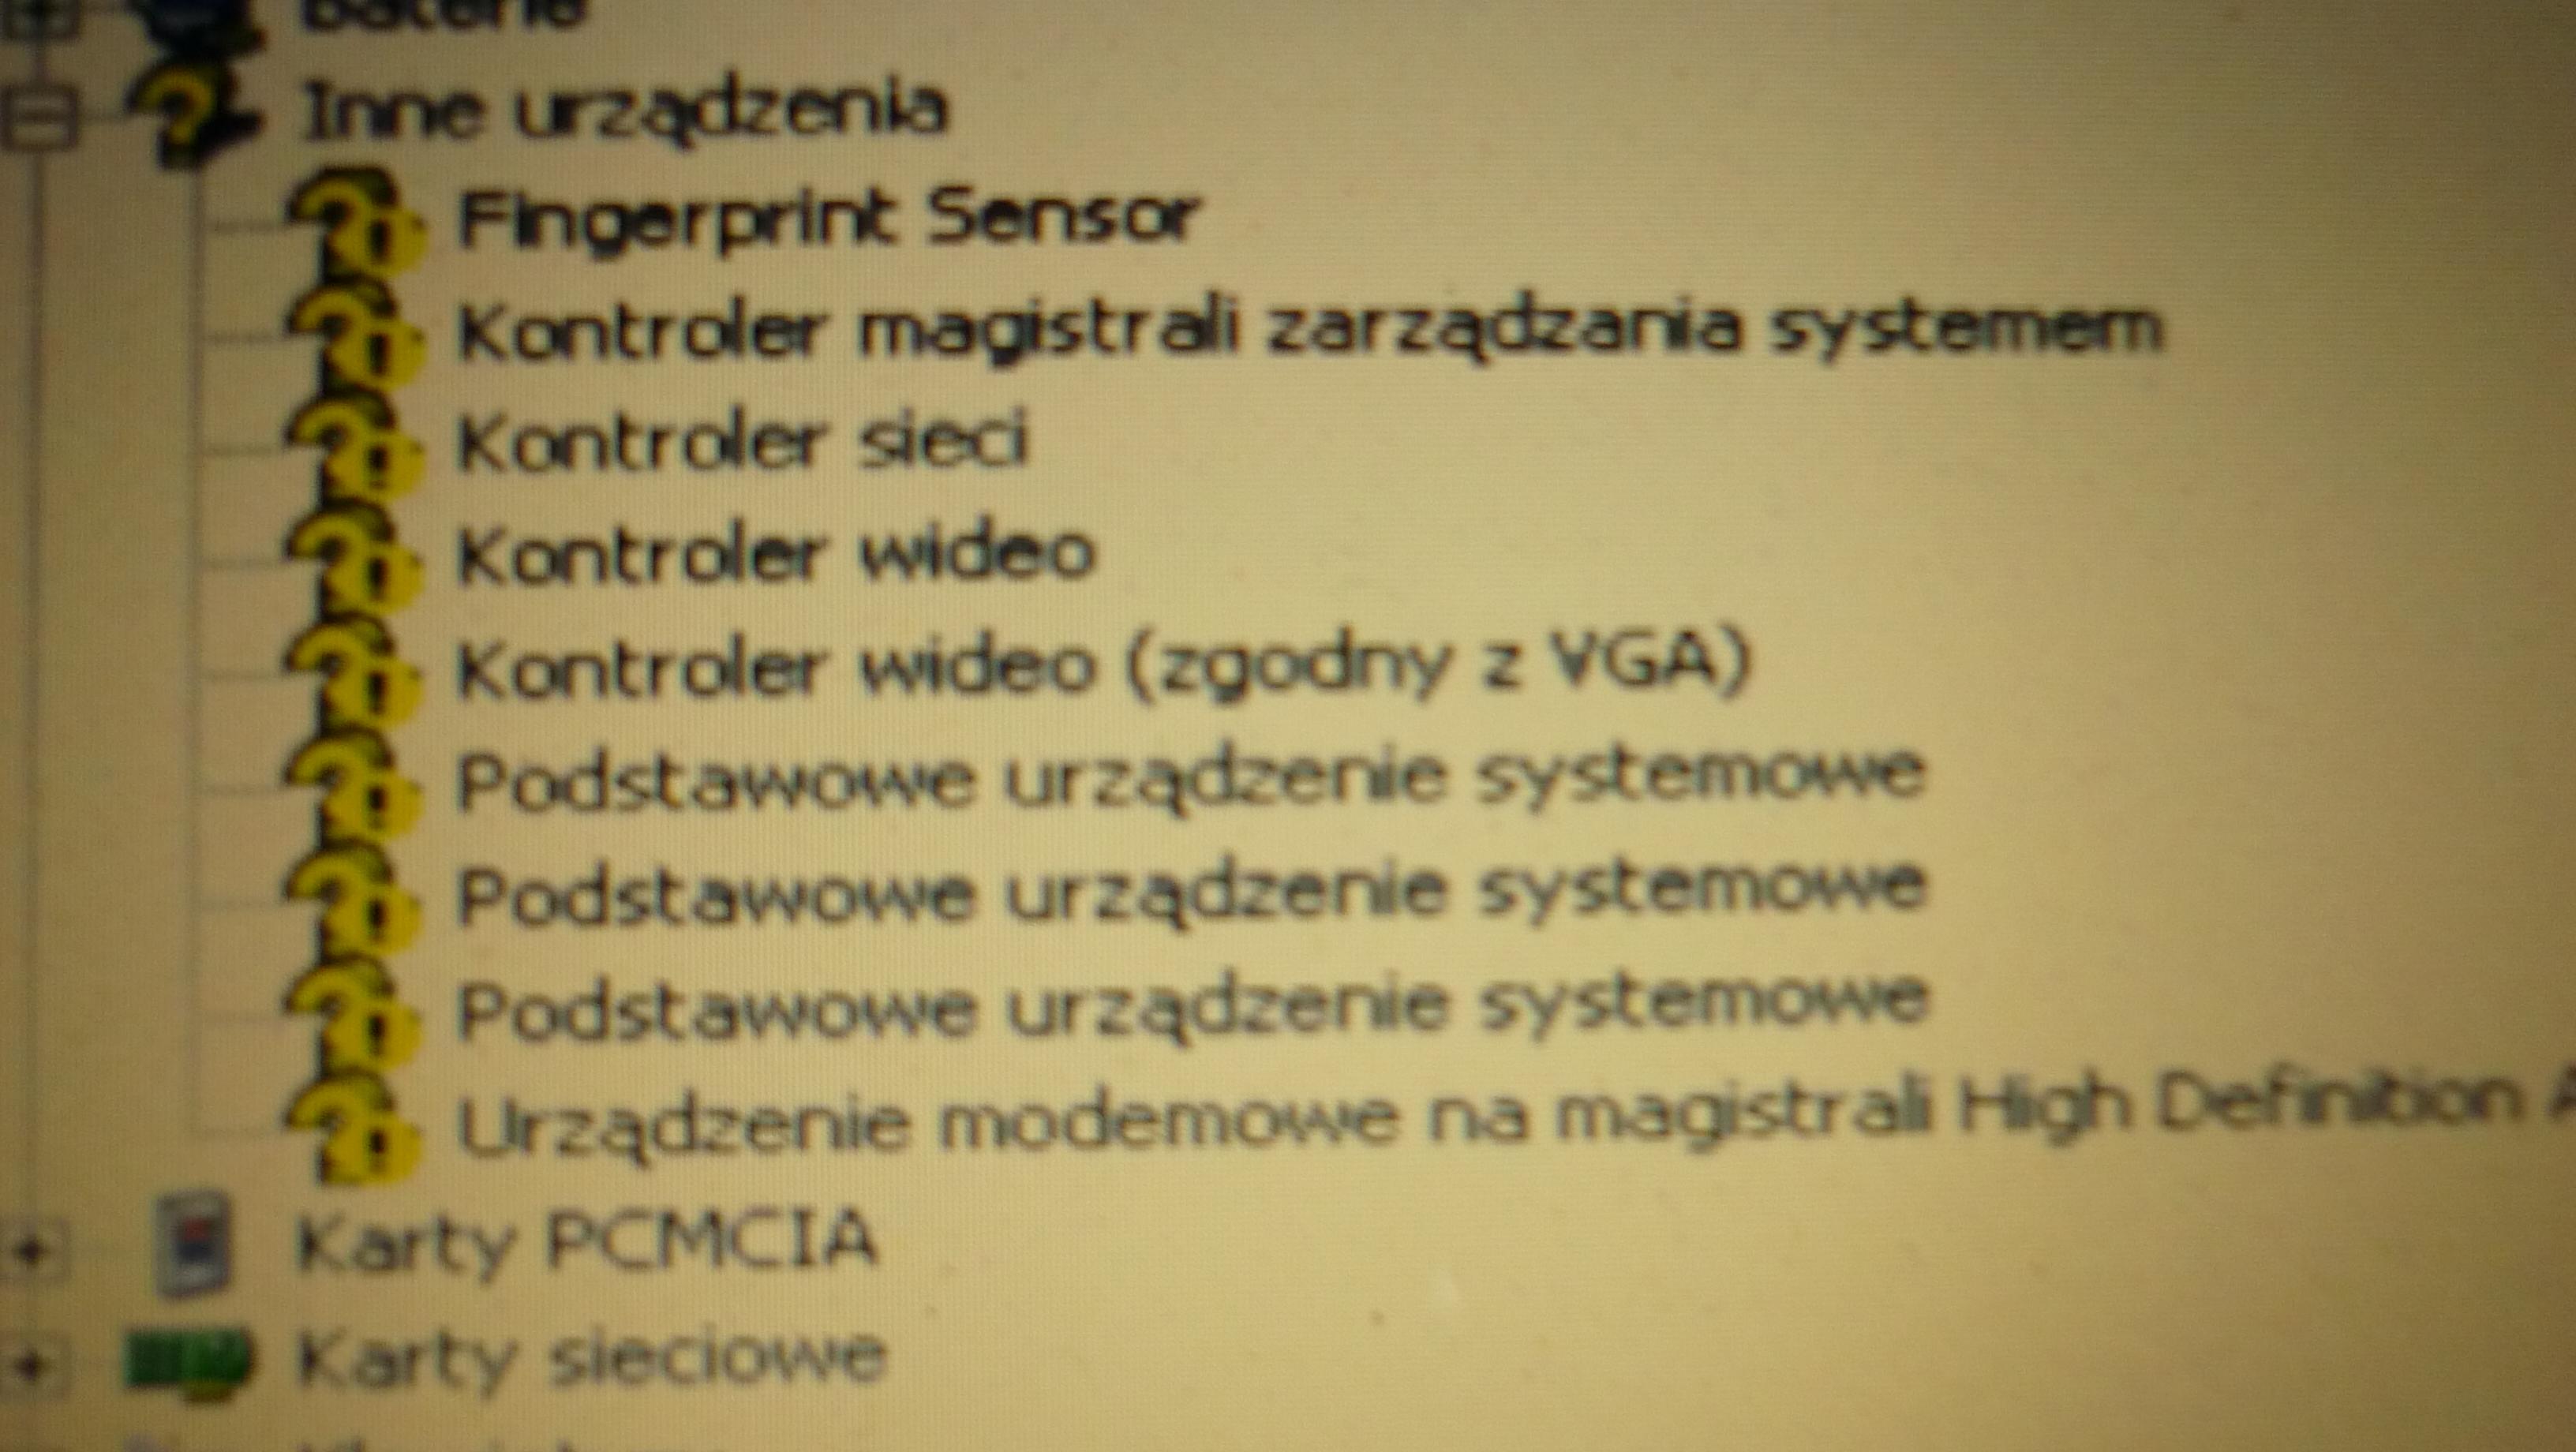 Lenovo 3000N100 - Po reinstalce XP SP3 brak sterownikow